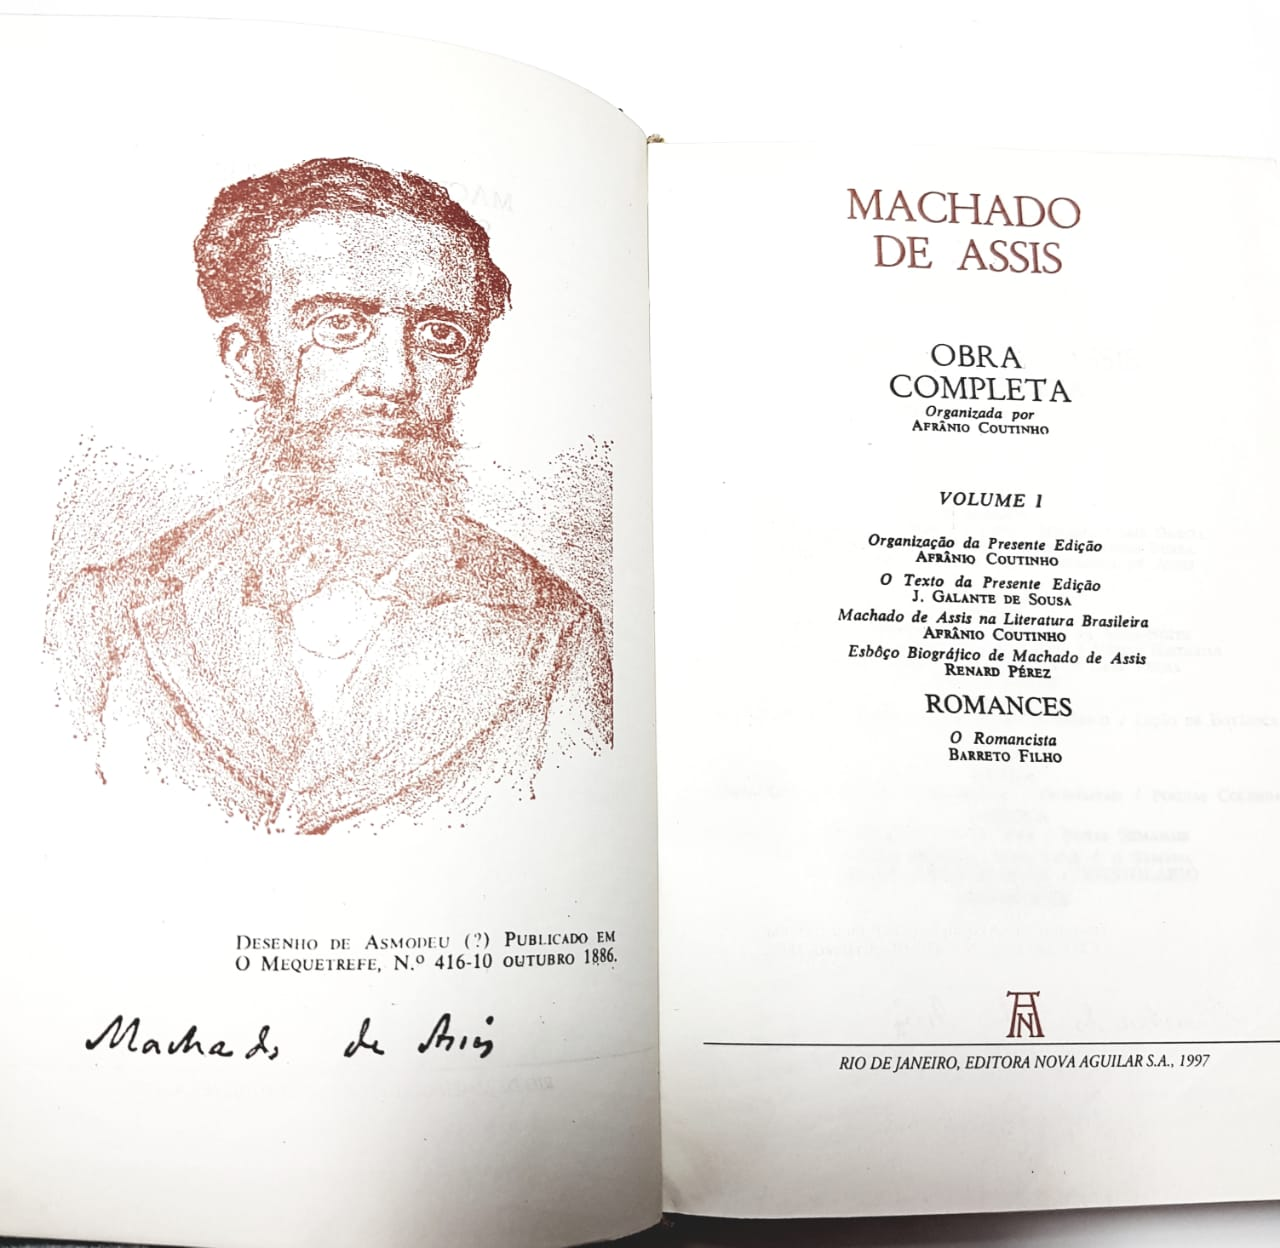 Machado de Assis/ Obra Completa/ Nova Aguilar/ 3 vol.